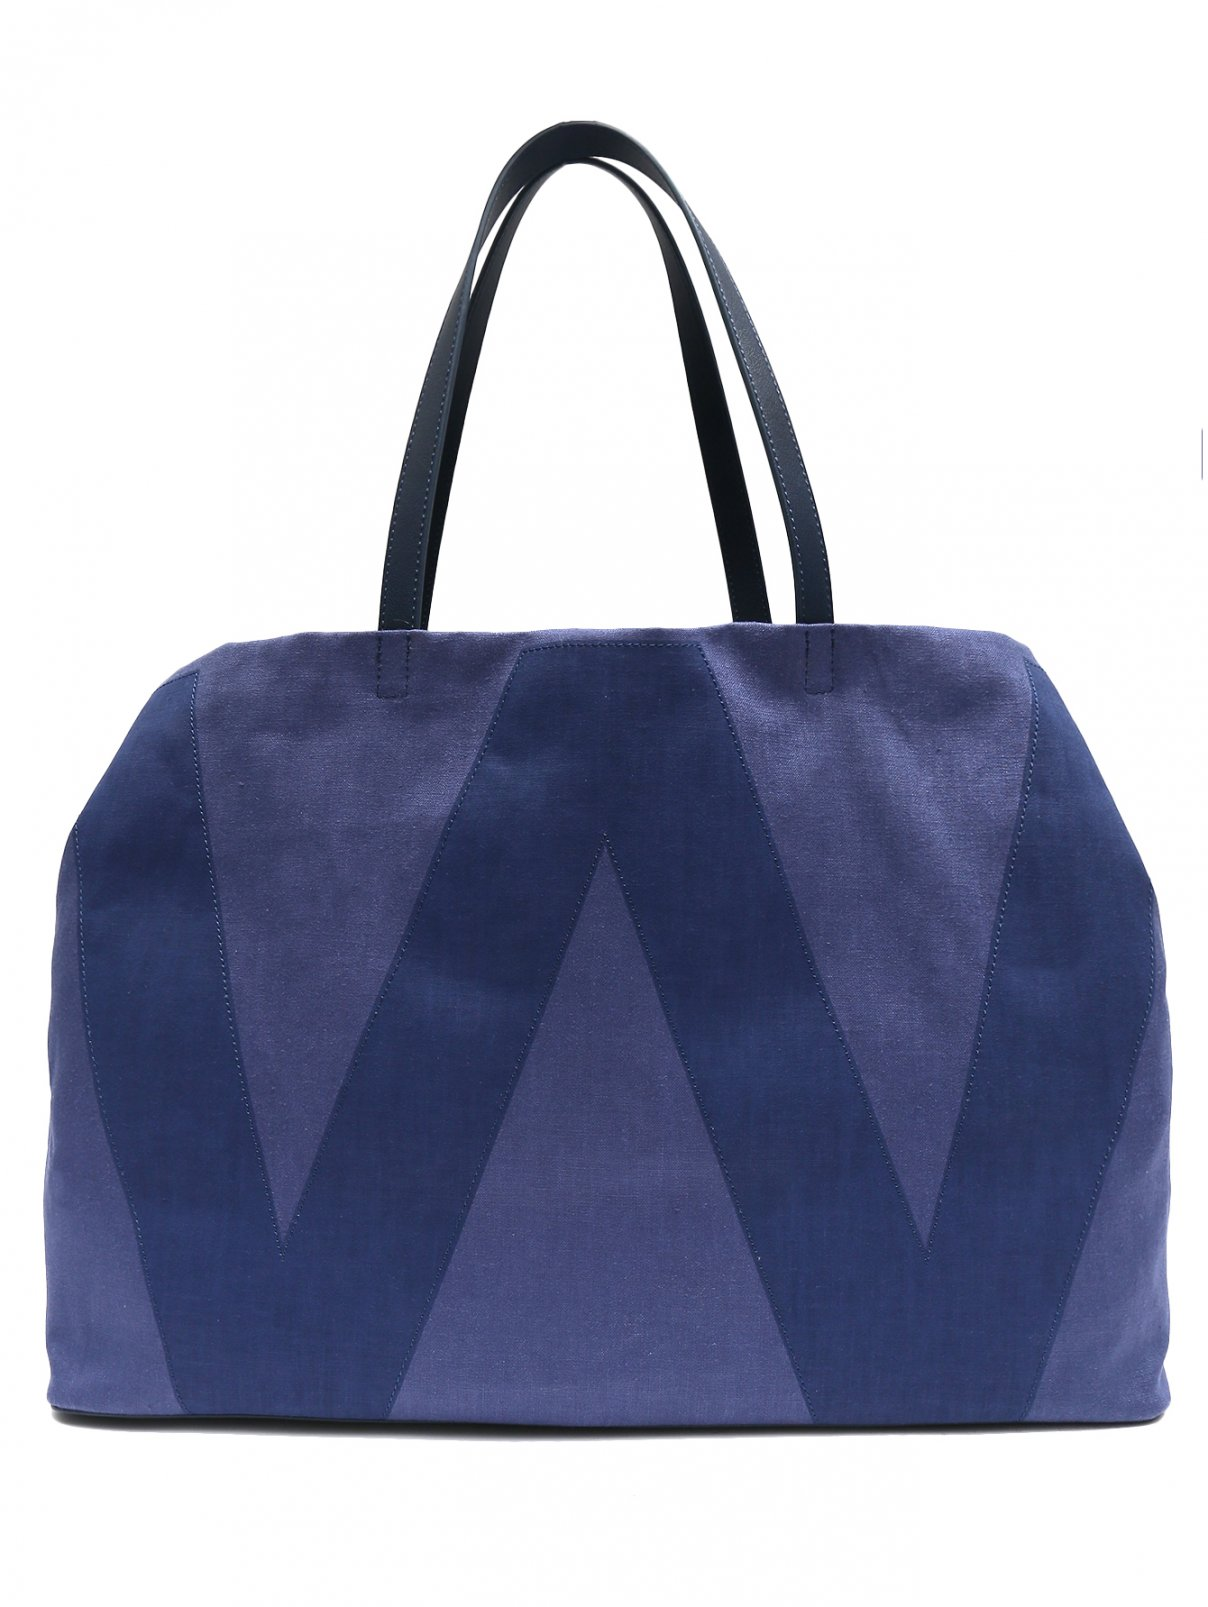 Объемная сумка из текстиля Weekend Max Mara  –  Общий вид